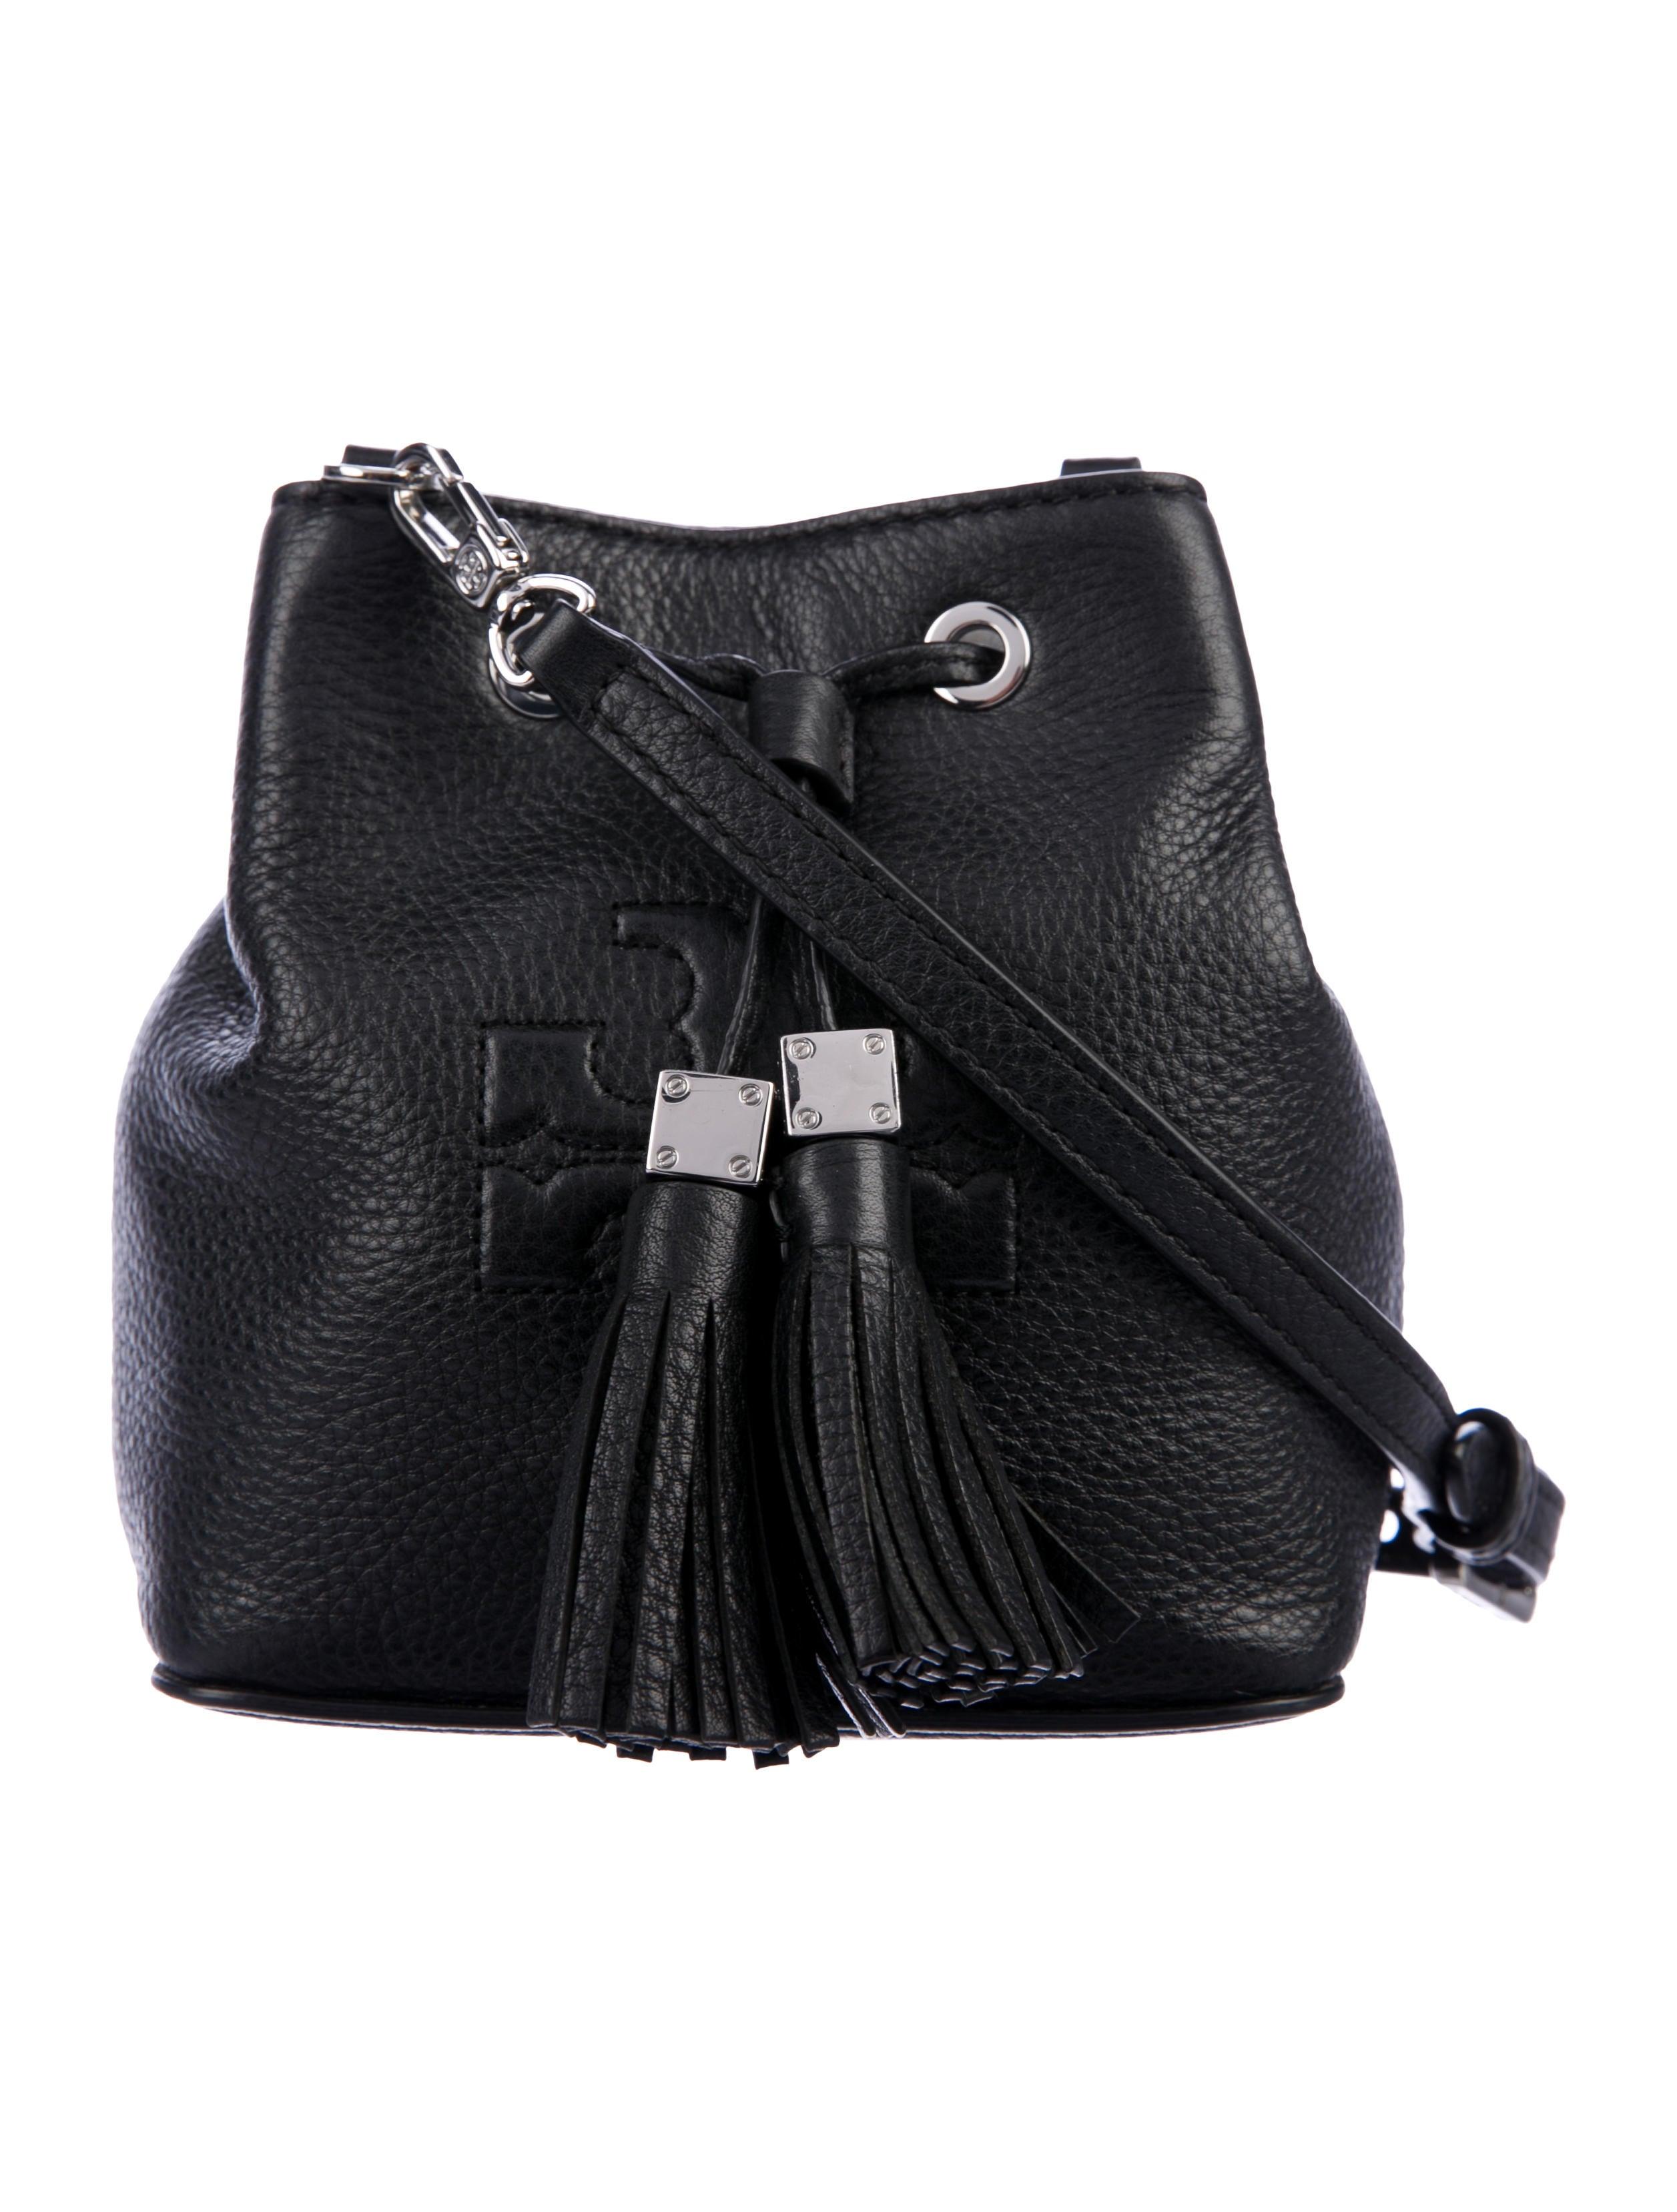 54fb8846b6a0 Tory Burch Thea Mini Bucket Crossbody Bag - Handbags - WTO139951 ...